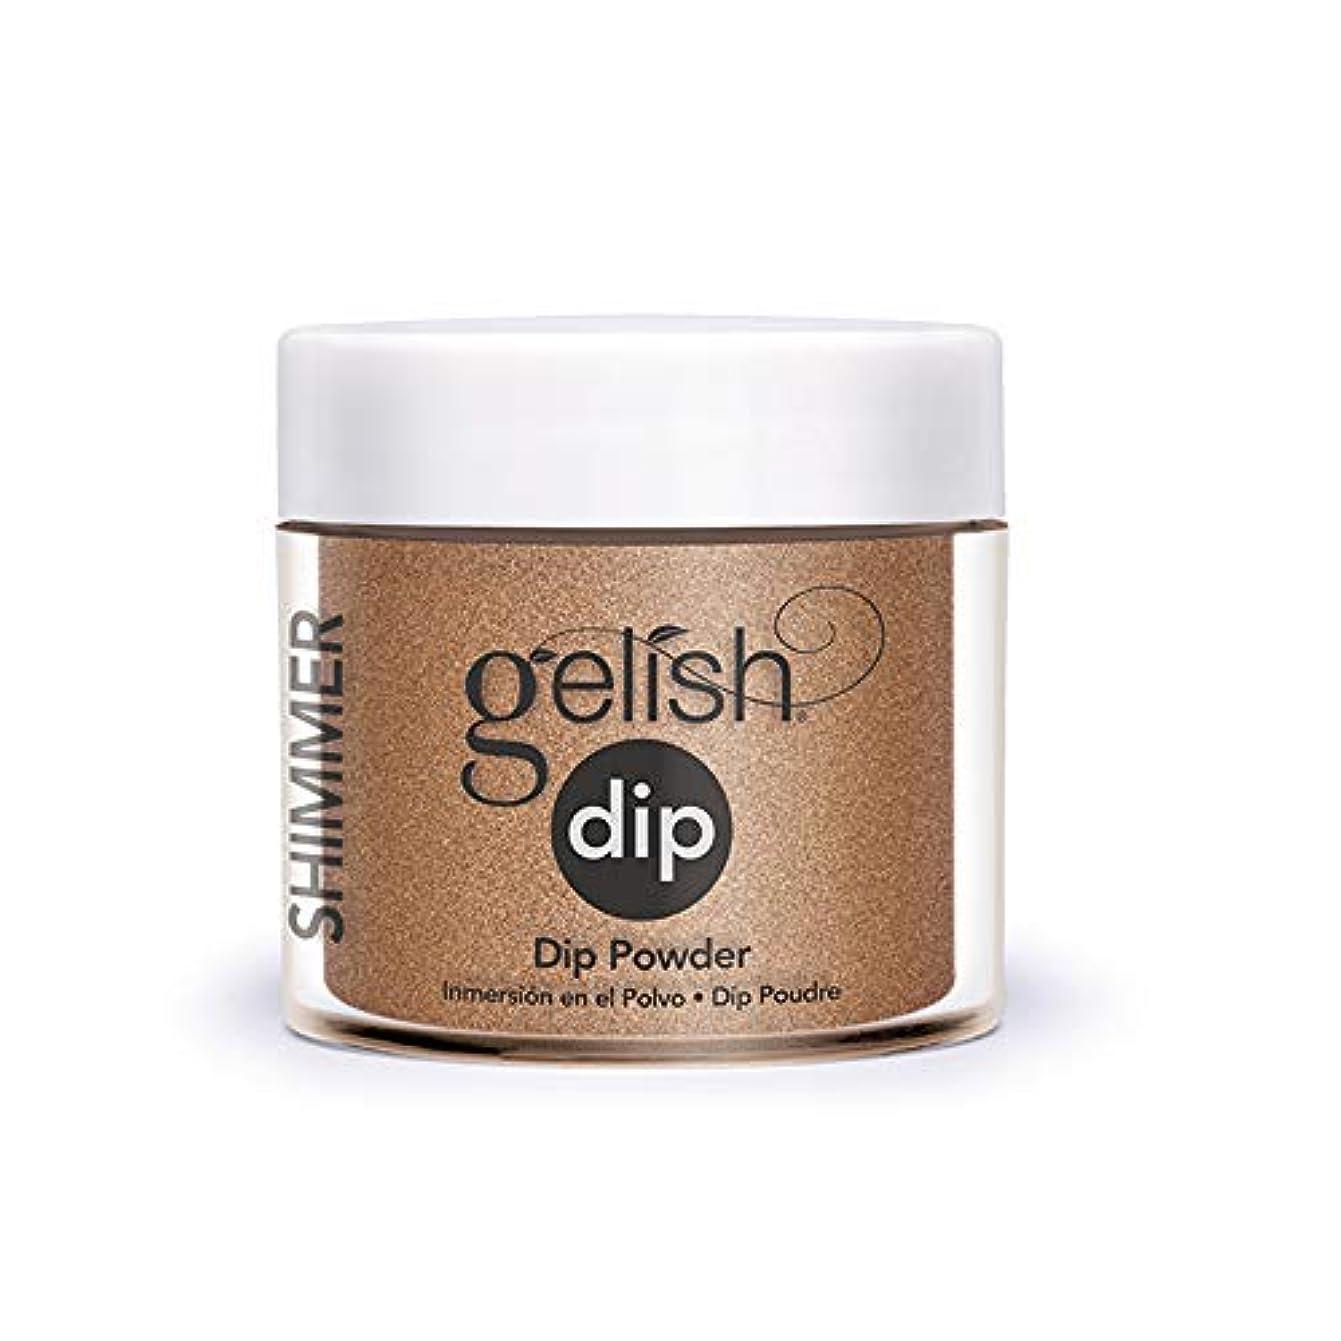 Harmony Gelish - Acrylic Dip Powder - Bronzed & Beautiful - 23g / 0.8oz